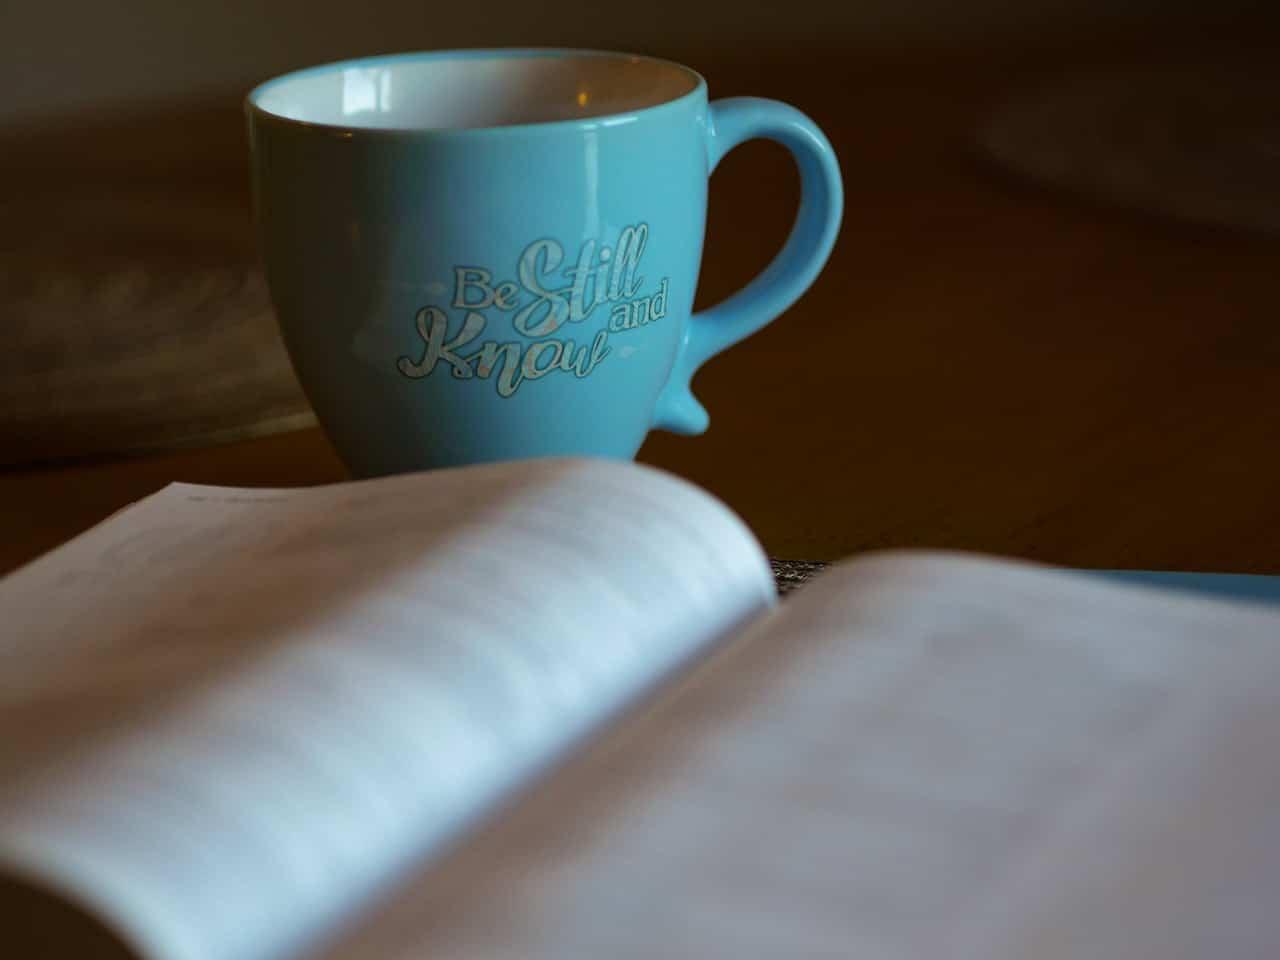 Pastor coffee mugs